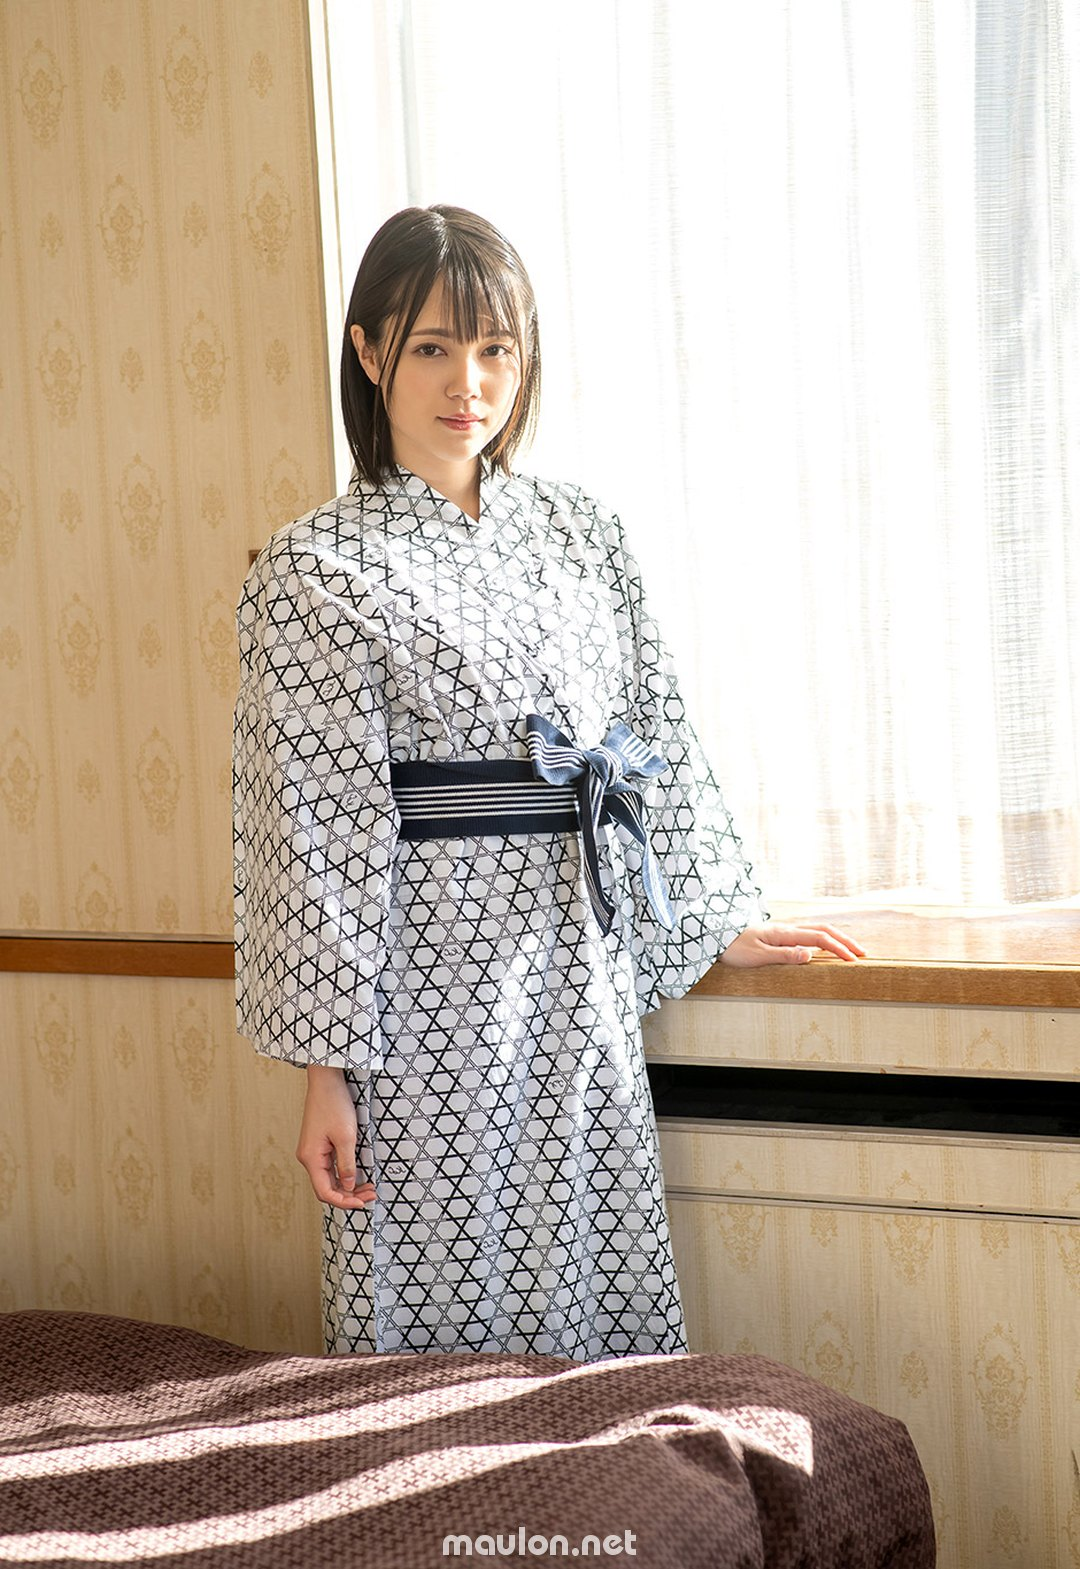 MauLon.Net - Ảnh sex idol dâm nữ Remu Suzumori